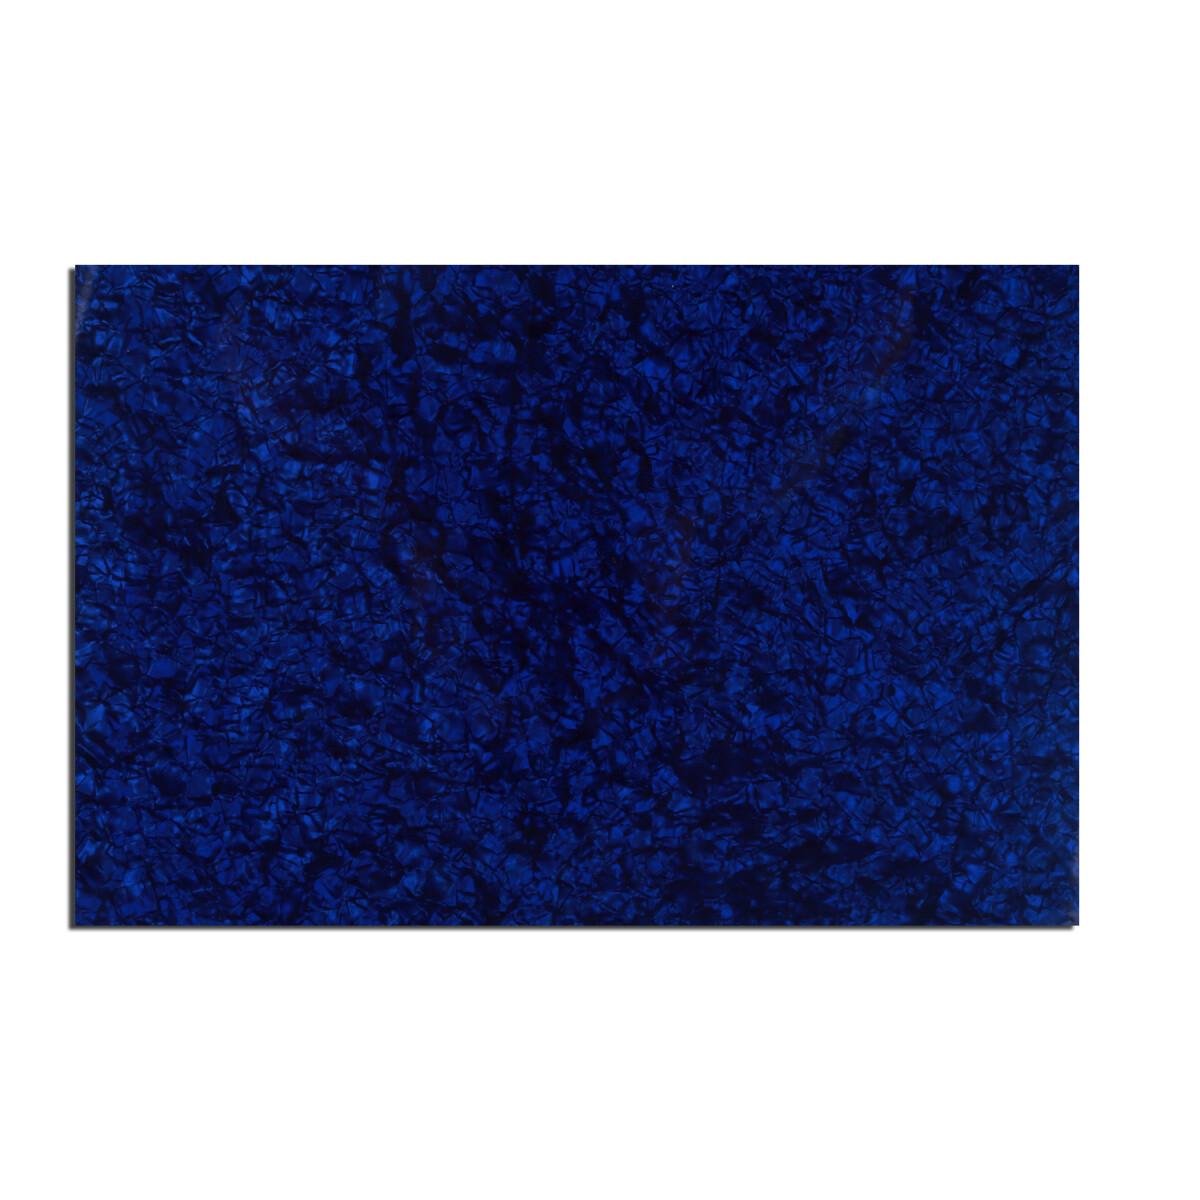 "Brio Pickguard Blanks 12"" x 17"" 4 Ply Pearloid Blue"